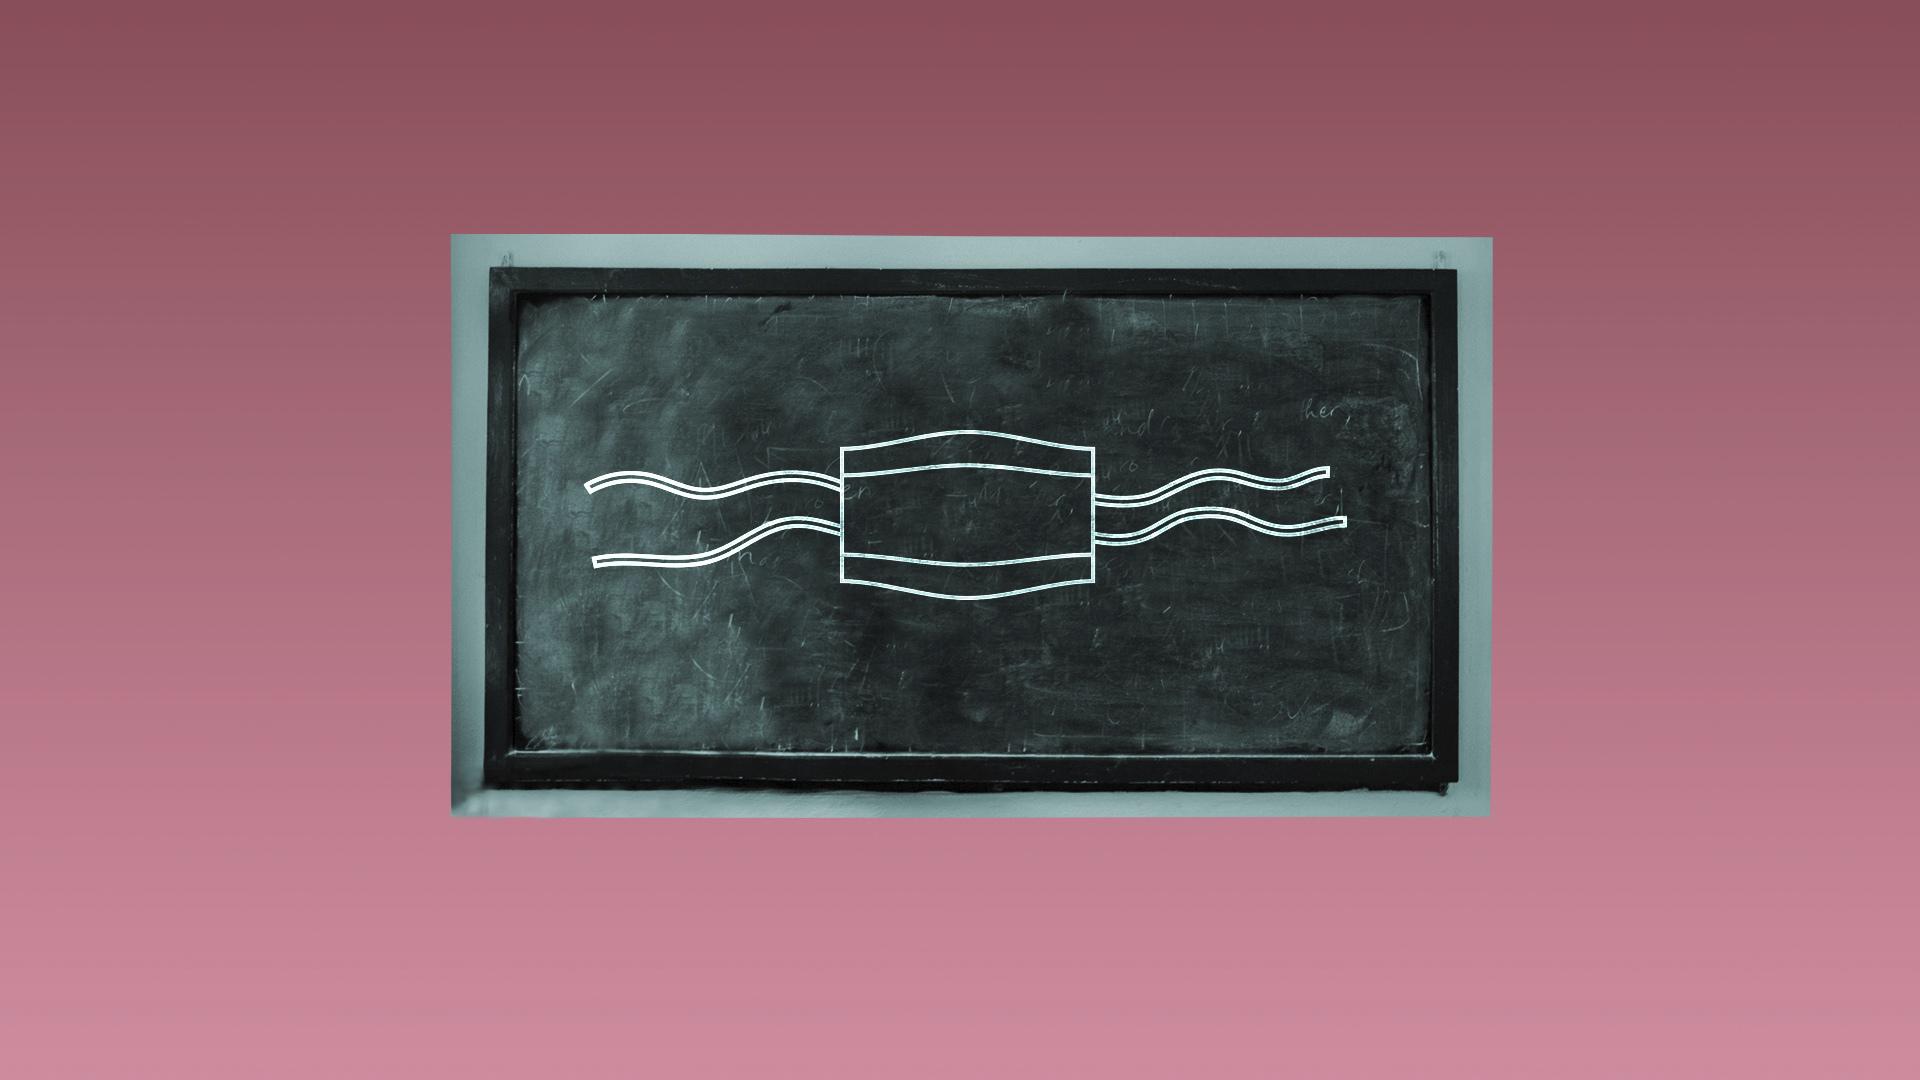 VIRUS OUTBREAK VIRAL QUESTIONS MASKS IN SCHOOLS